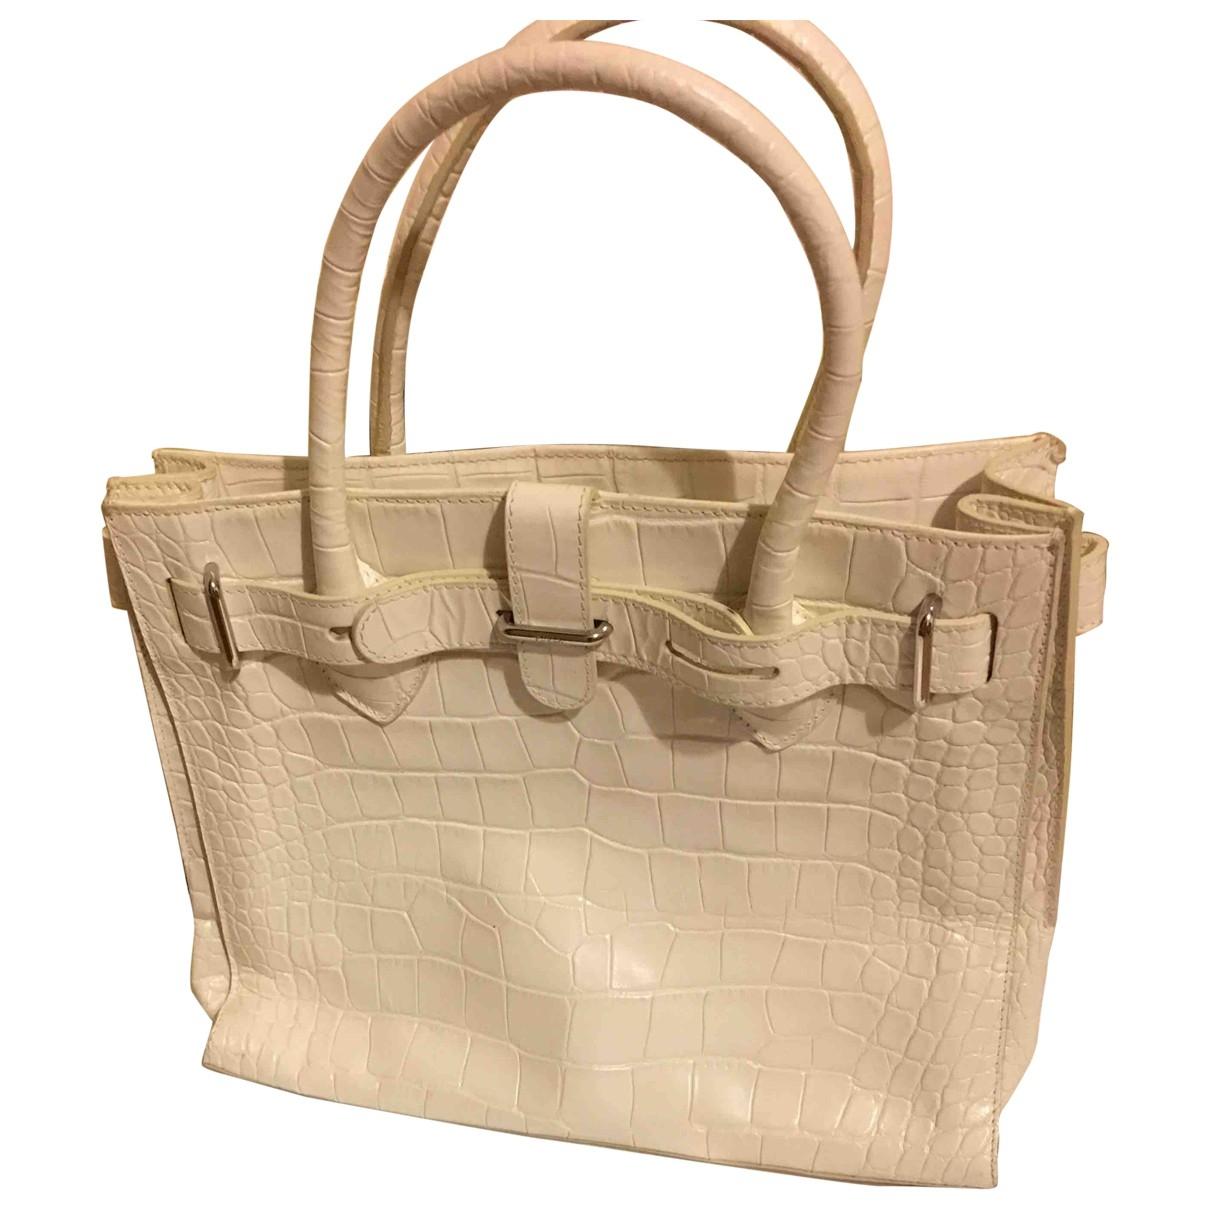 Furla \N Handtasche in  Ecru Lackleder